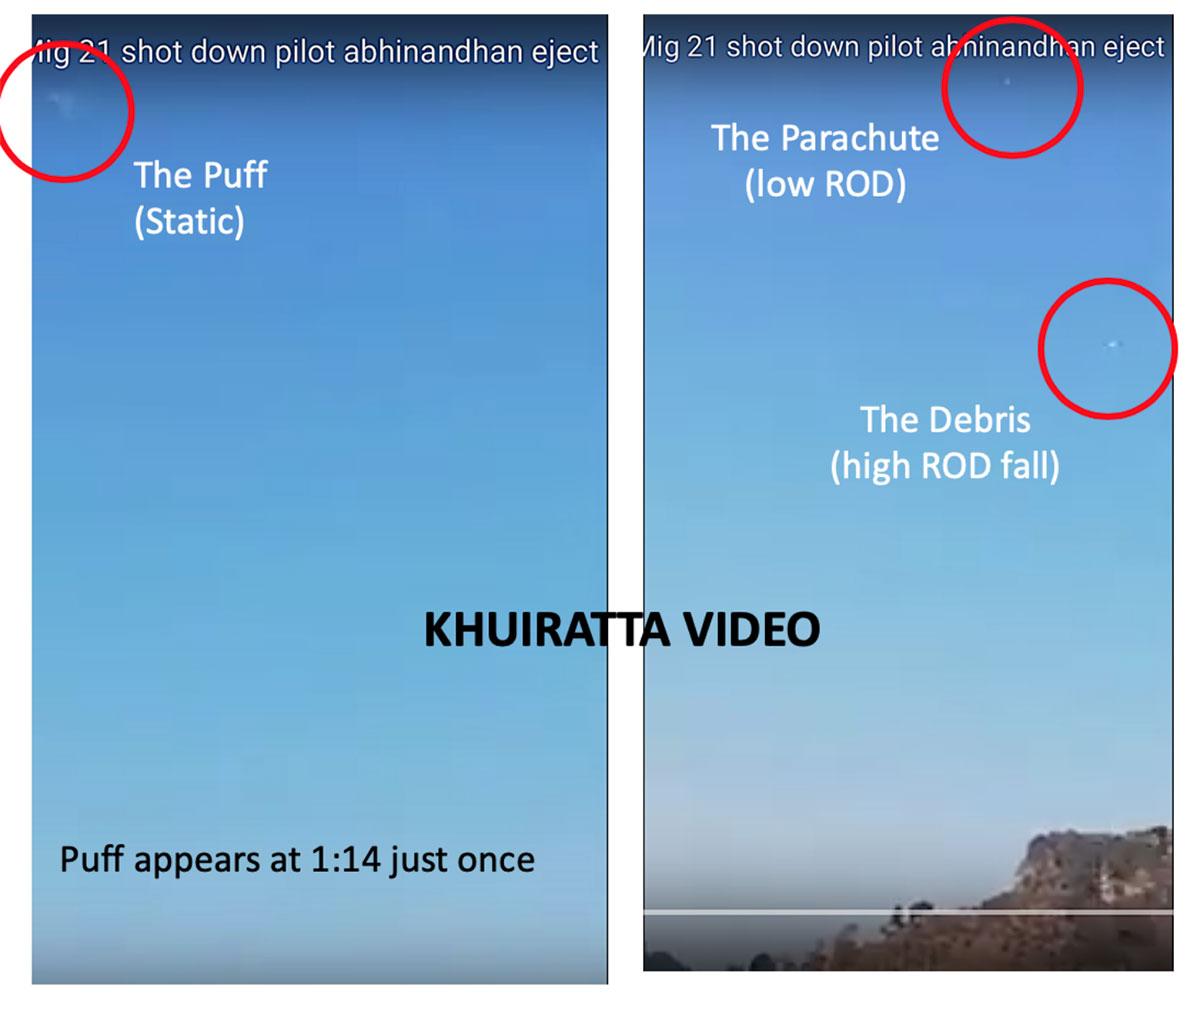 Using Open Source Intelligence (OSINT) to show how IAF's Abhinandan shot down a Pakistani F-16 53